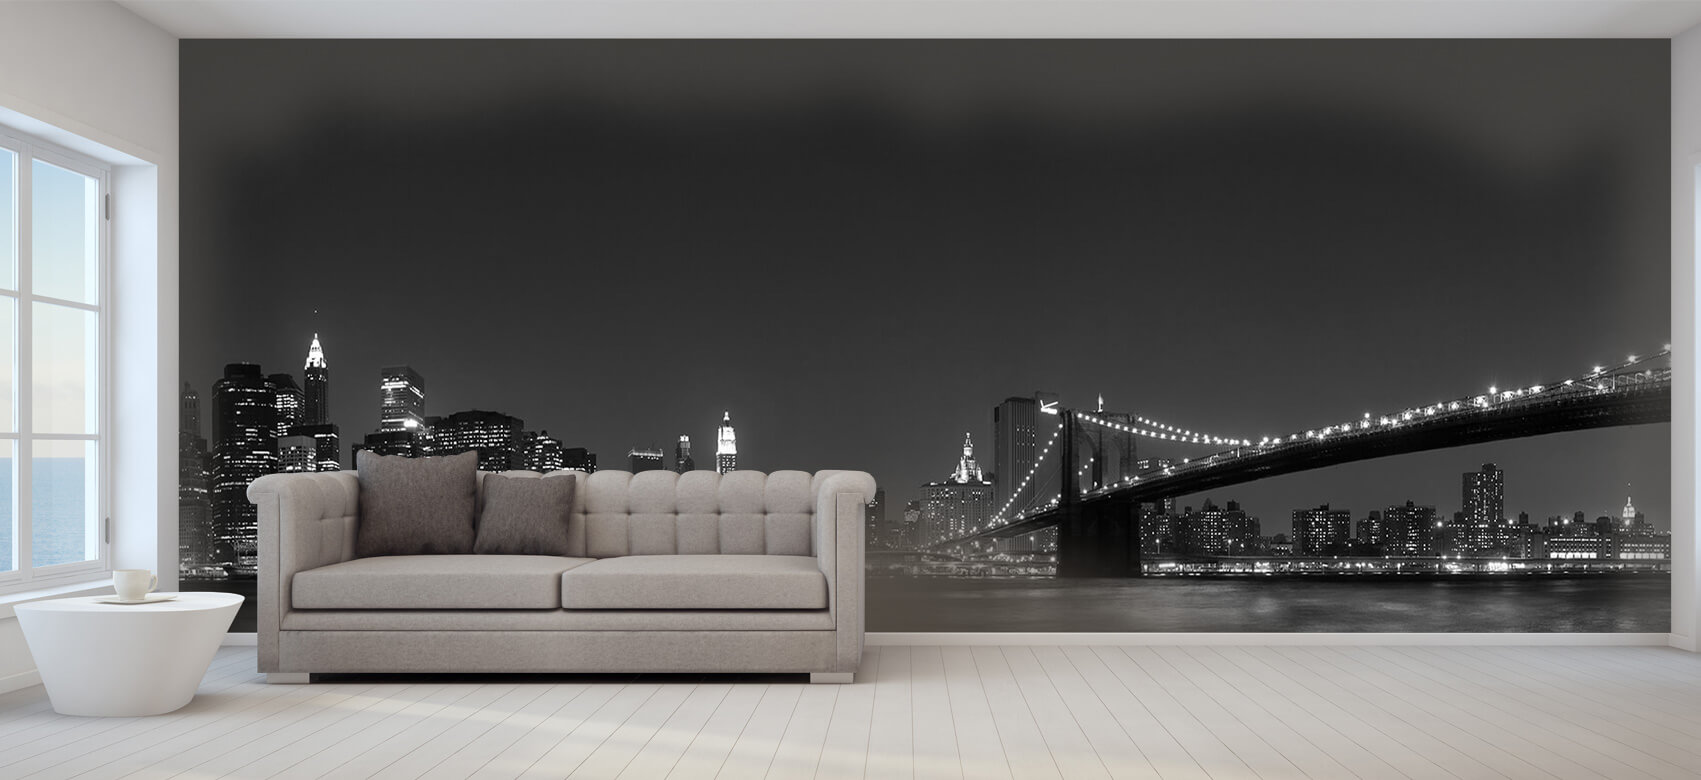 Nacht Manhattan Skyline and Brooklyn Bridge 9